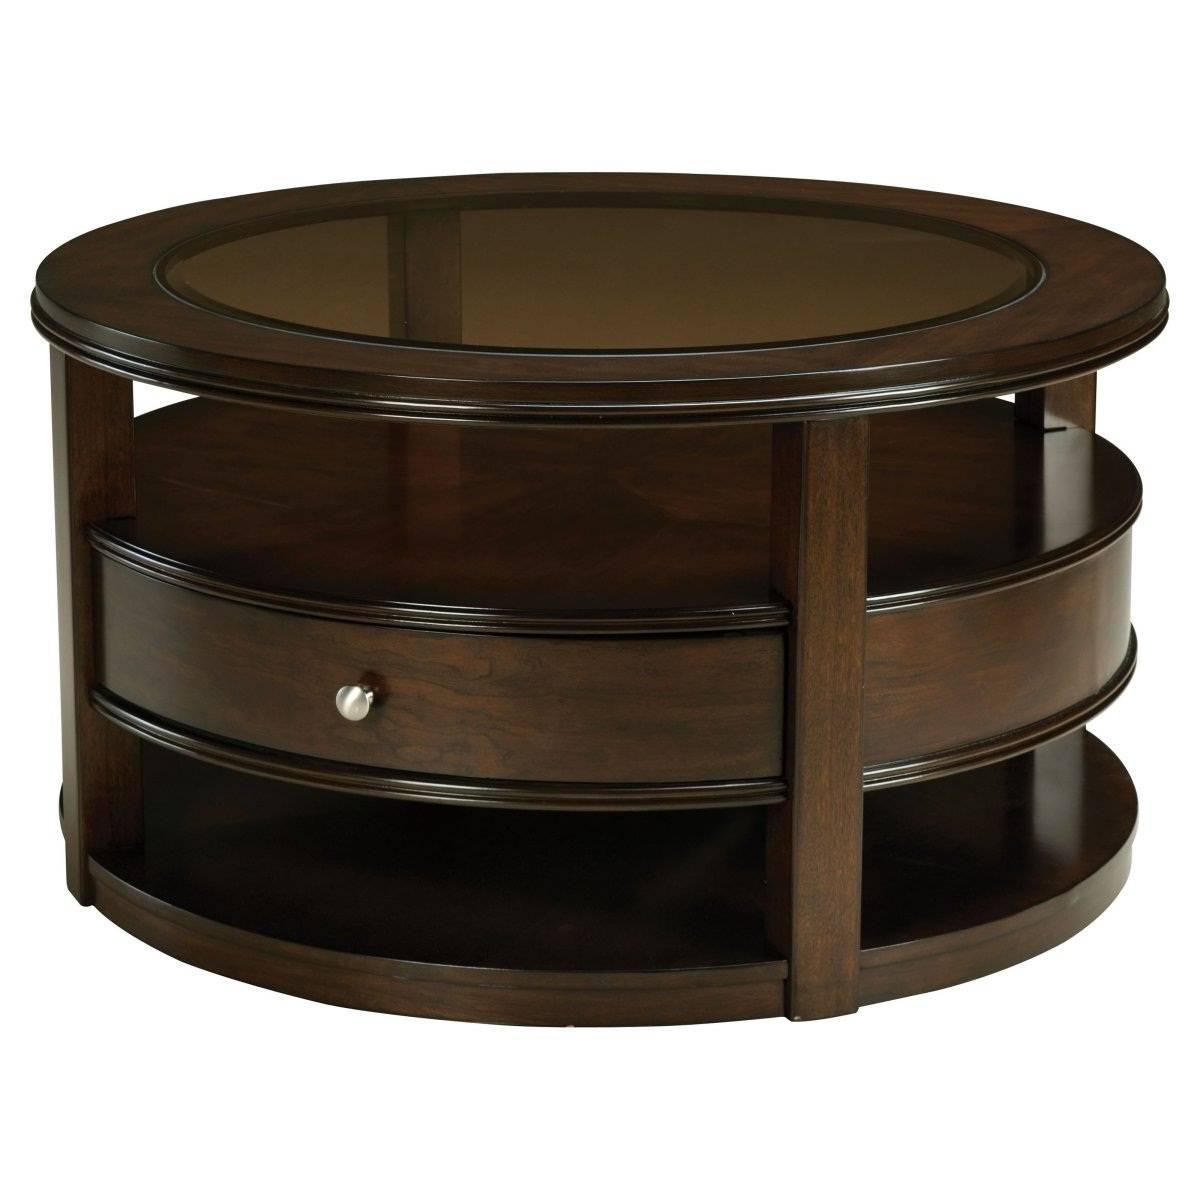 Round Dark Wood Coffee Table Starrkingschool - Jericho Mafjar Project with regard to Dark Wood Round Coffee Tables (Image 28 of 30)